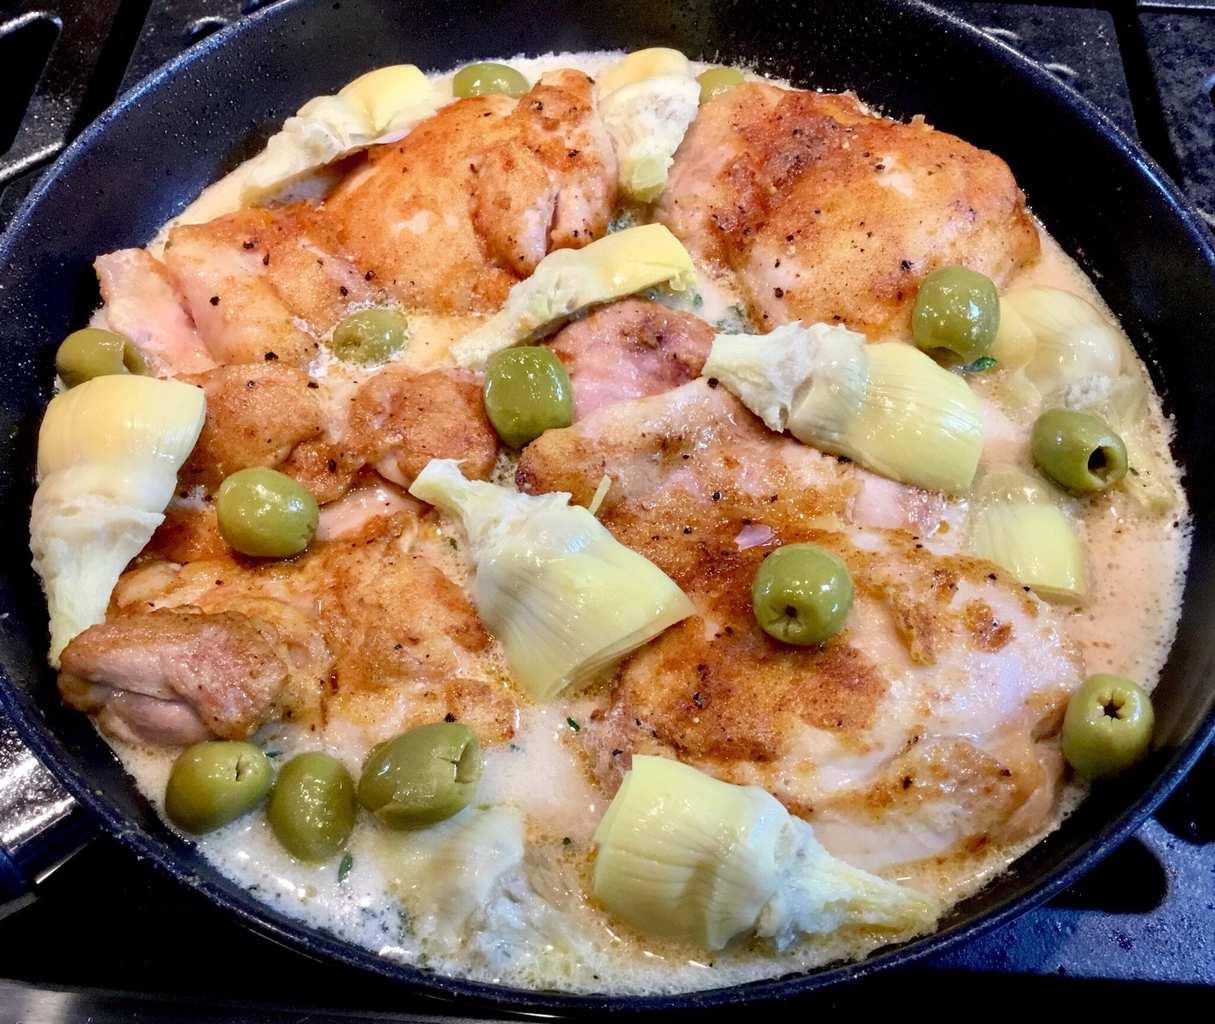 Mediterranean Lemon Butter Chicken before baking